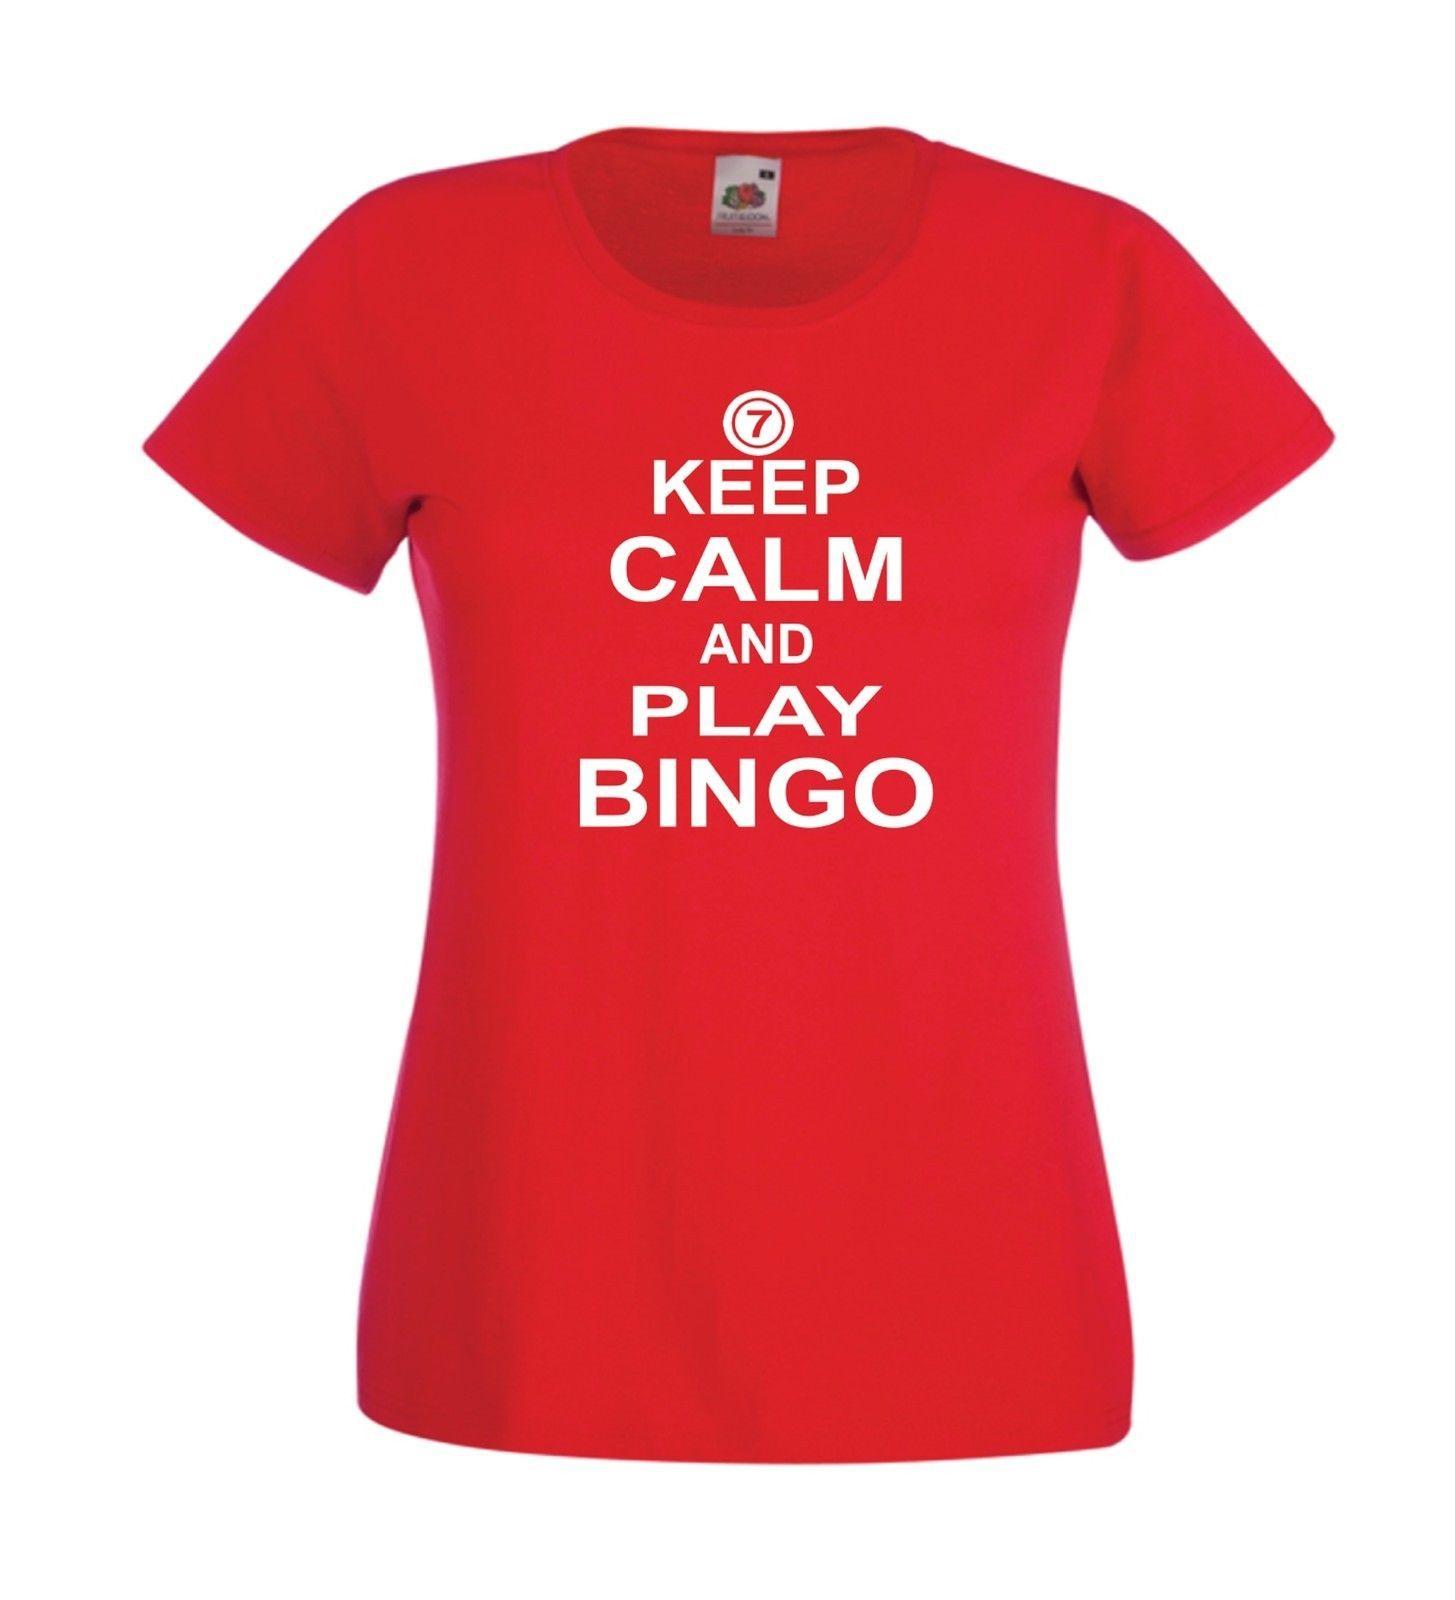 KEEP CALM PLAY BINGO Mothers Grandma Christmas Birthday Gift Mens Womens T SHIRT Funny Unisex Casual Tee Shirst It Shirt From Universal Fashion